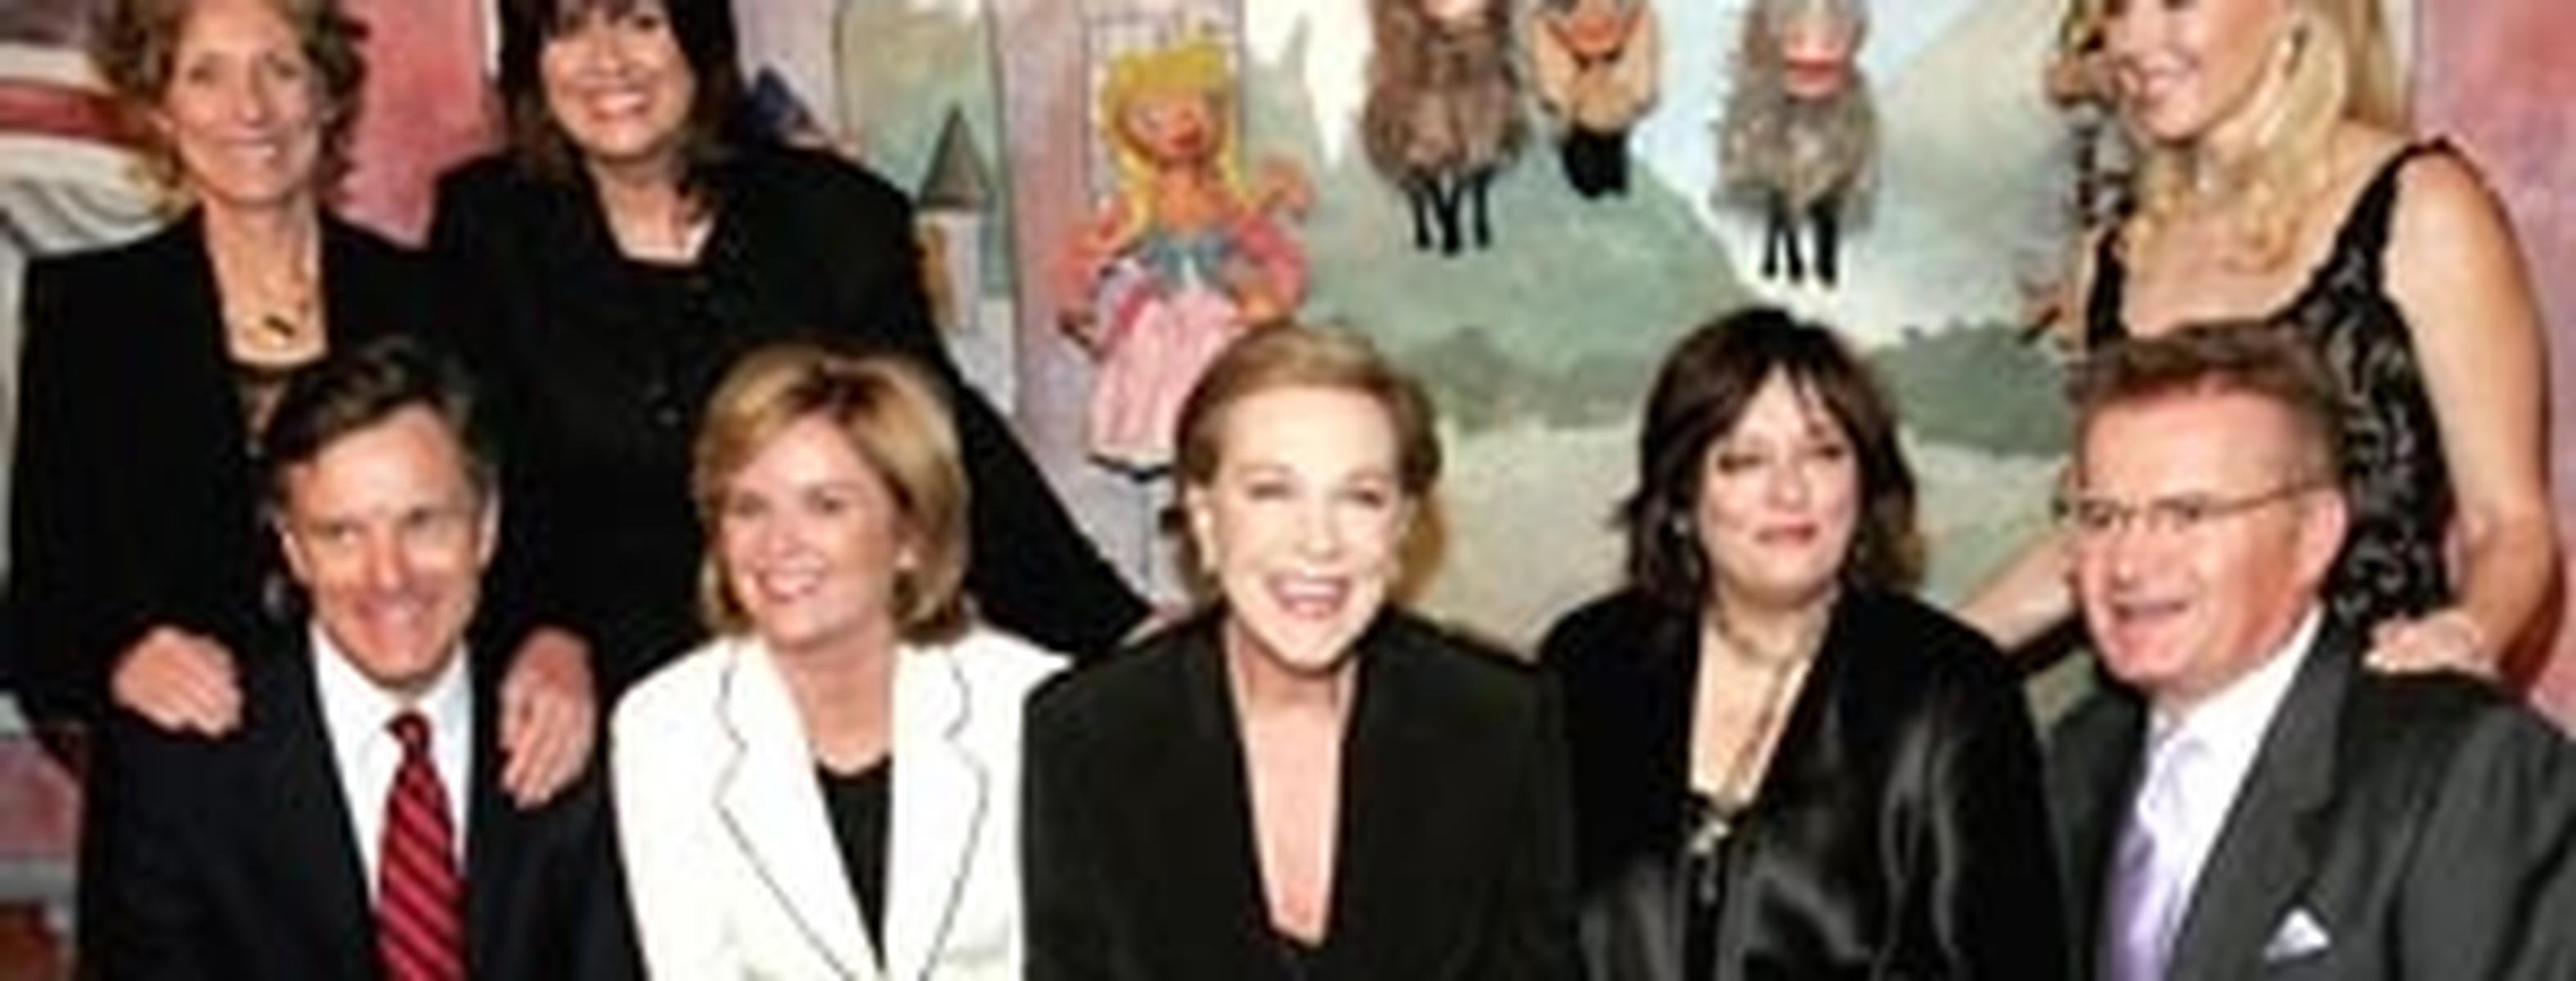 Sound Of Music Cast To Reunite On Oprah